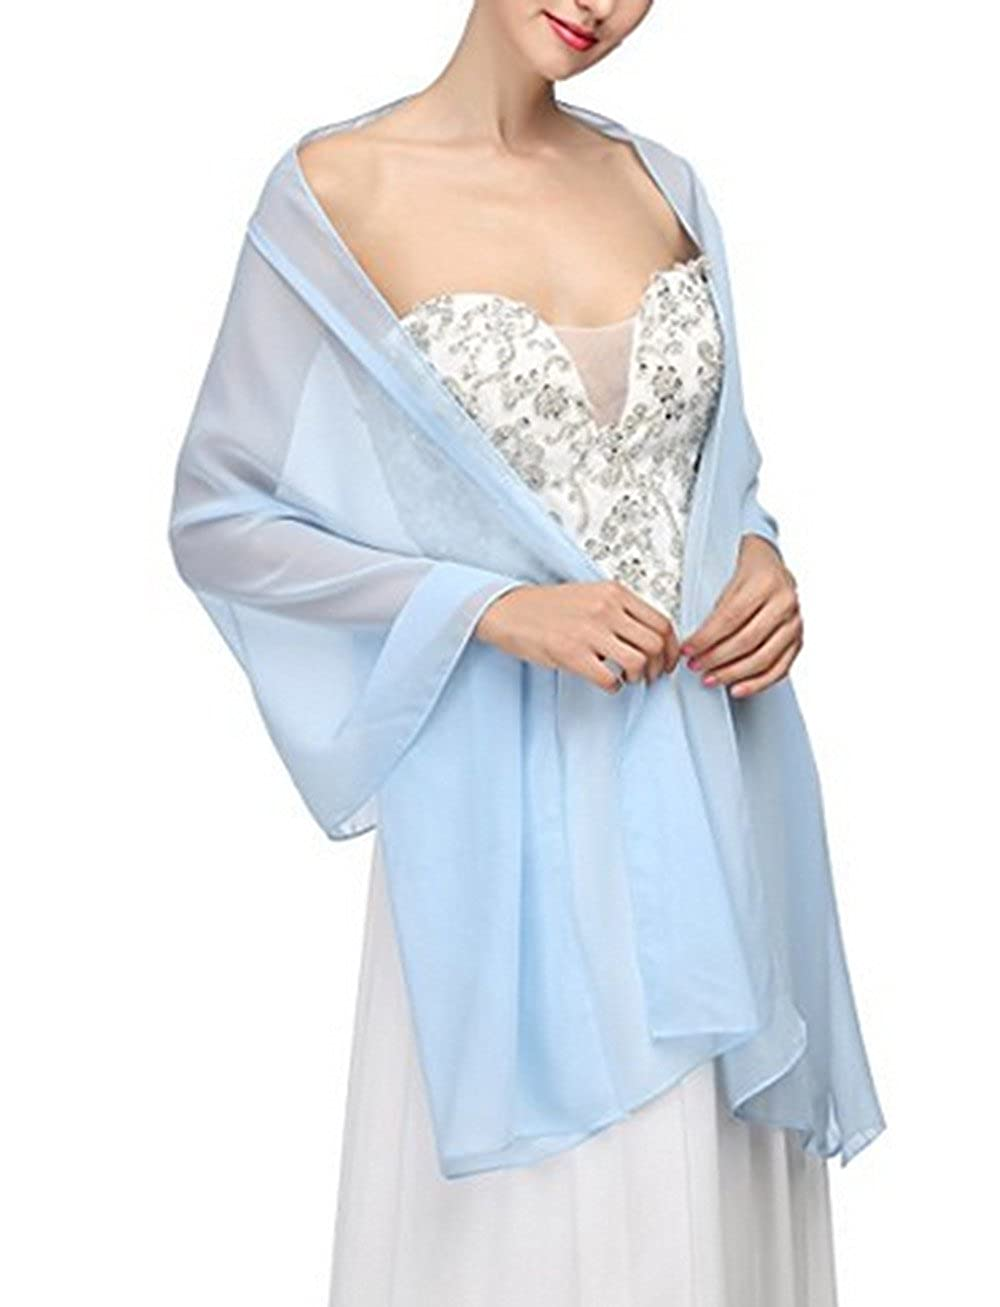 AngelaLove Chiffon Bridal Wedding Shawl Wrap Prom Evening Dress Stole Scarves